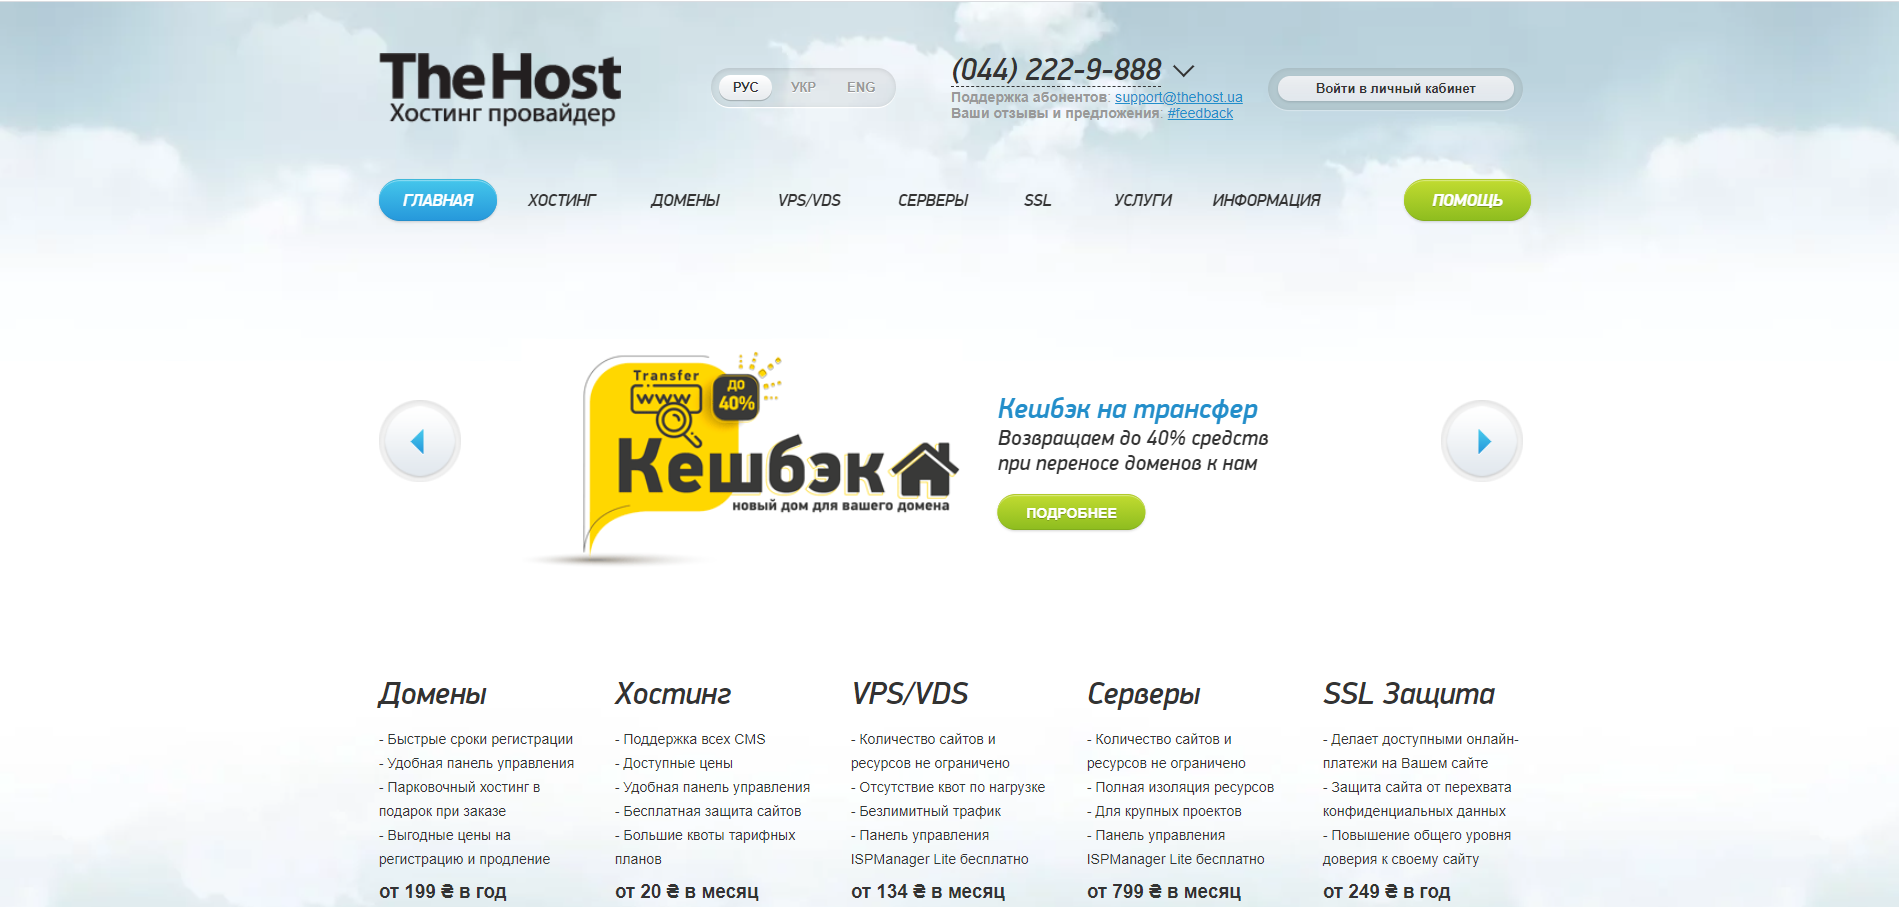 Покупка домена на TheHost